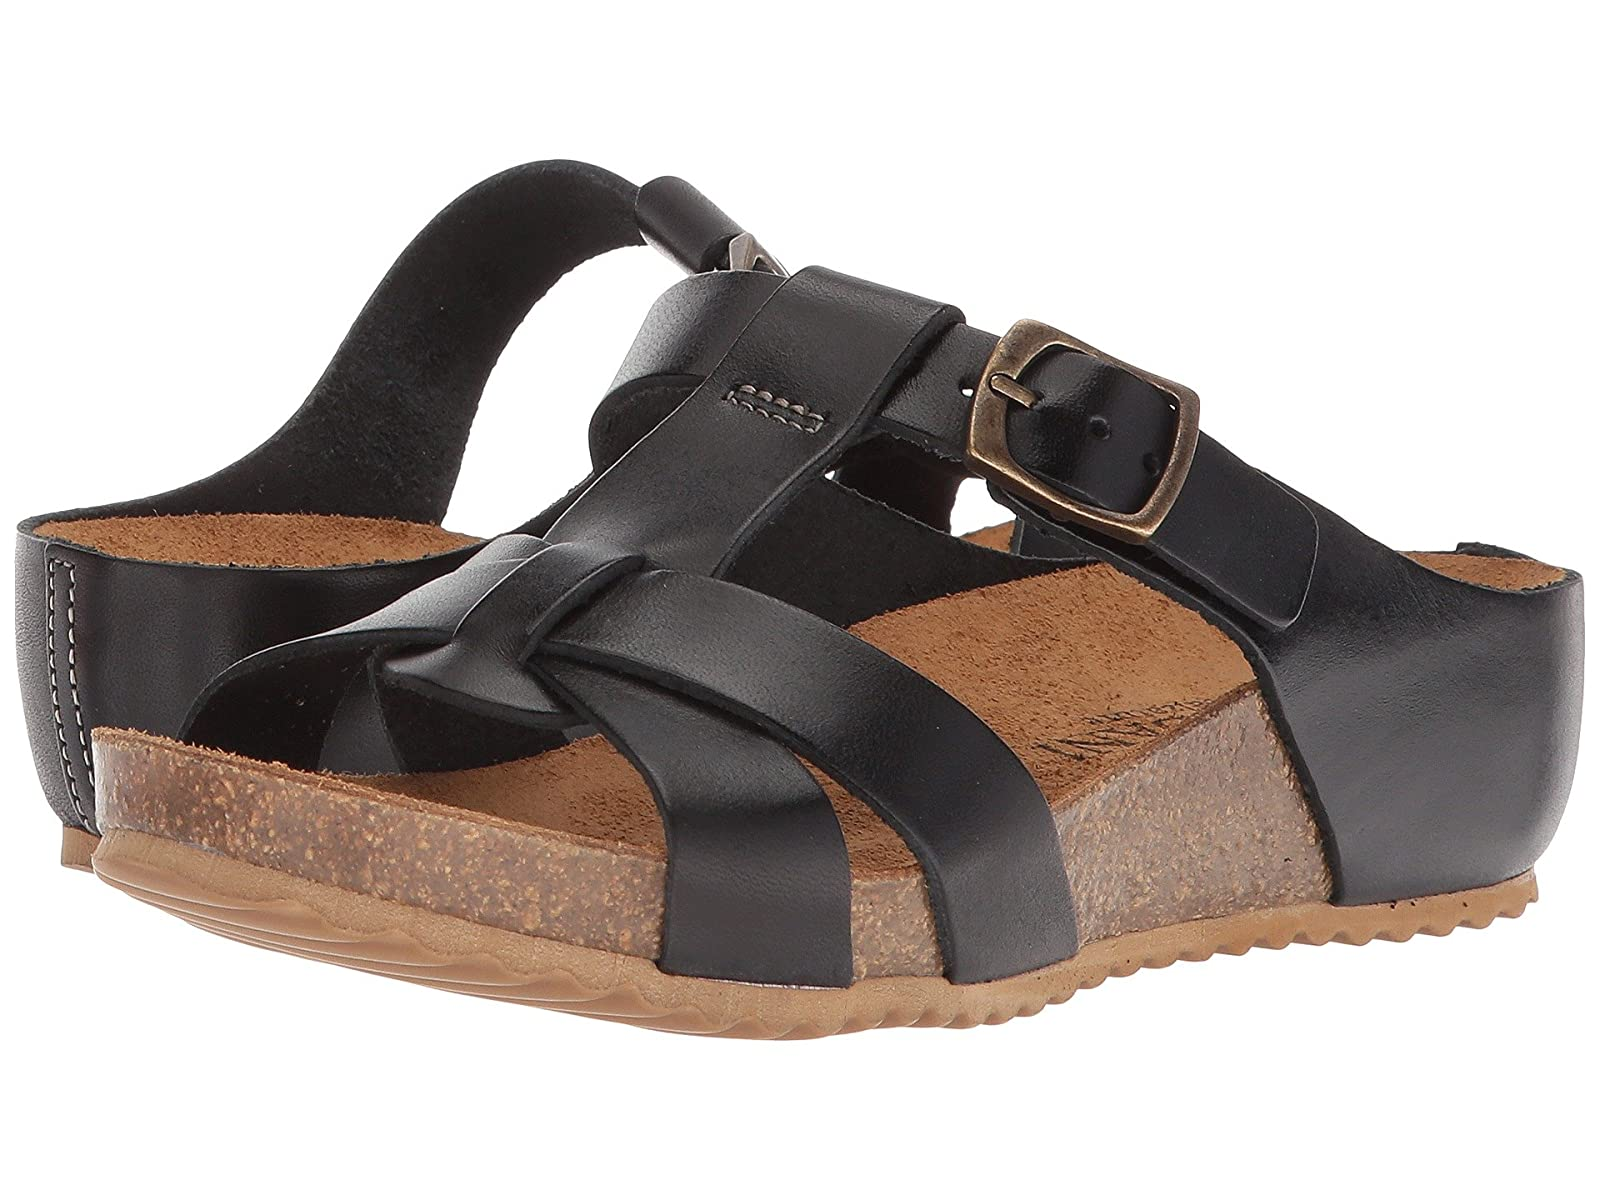 Cordani MaloneComfortable and distinctive shoes